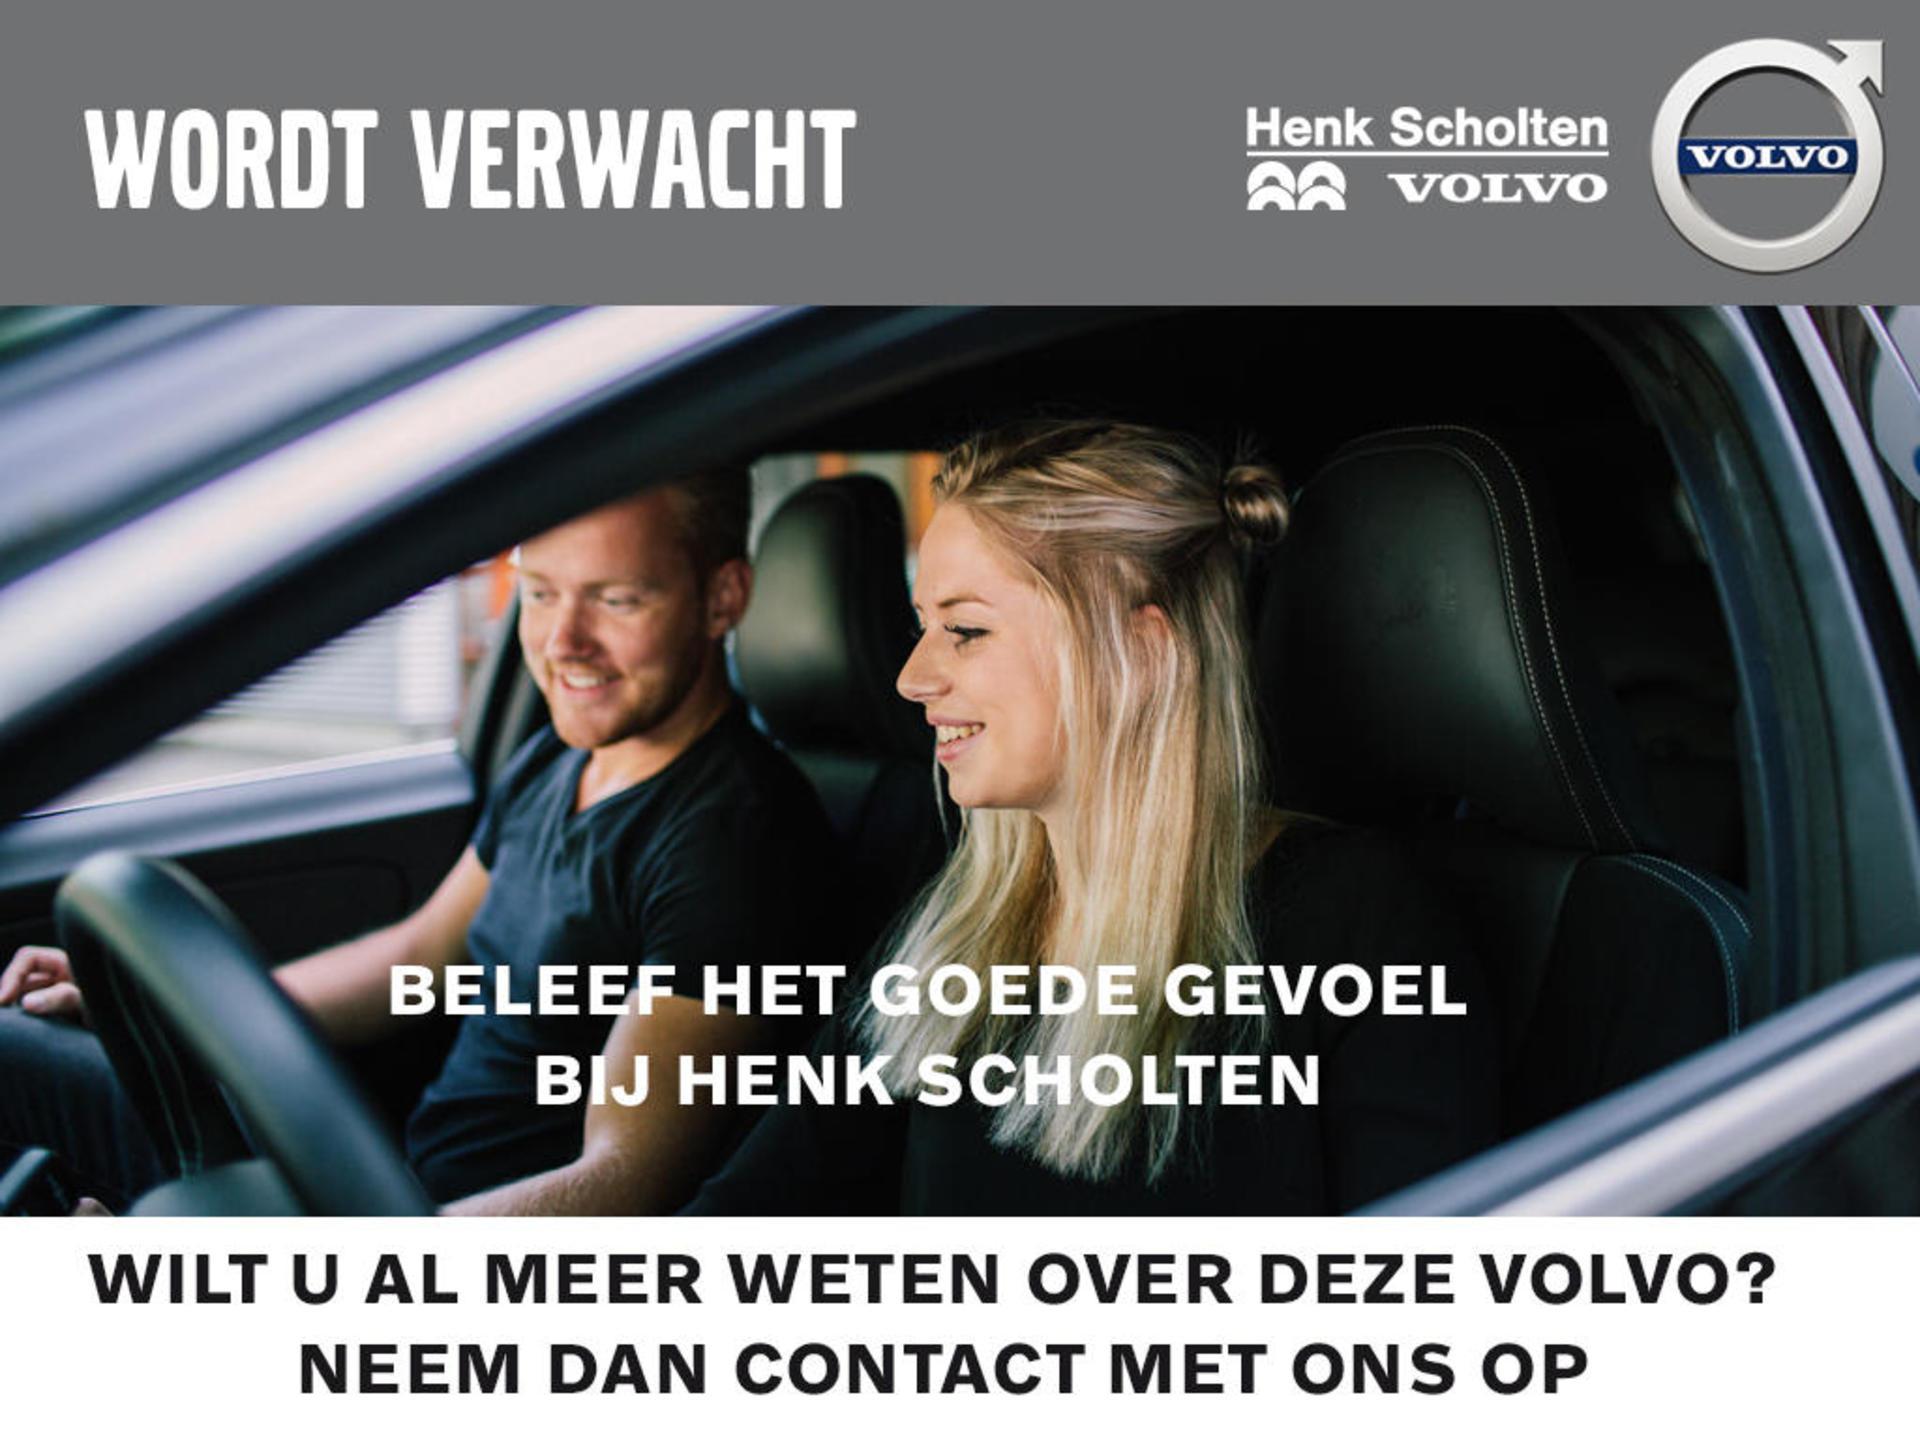 Volvo V90 T4 190 pk gt r-design, bus. sport, lux. line, scandinavian line,